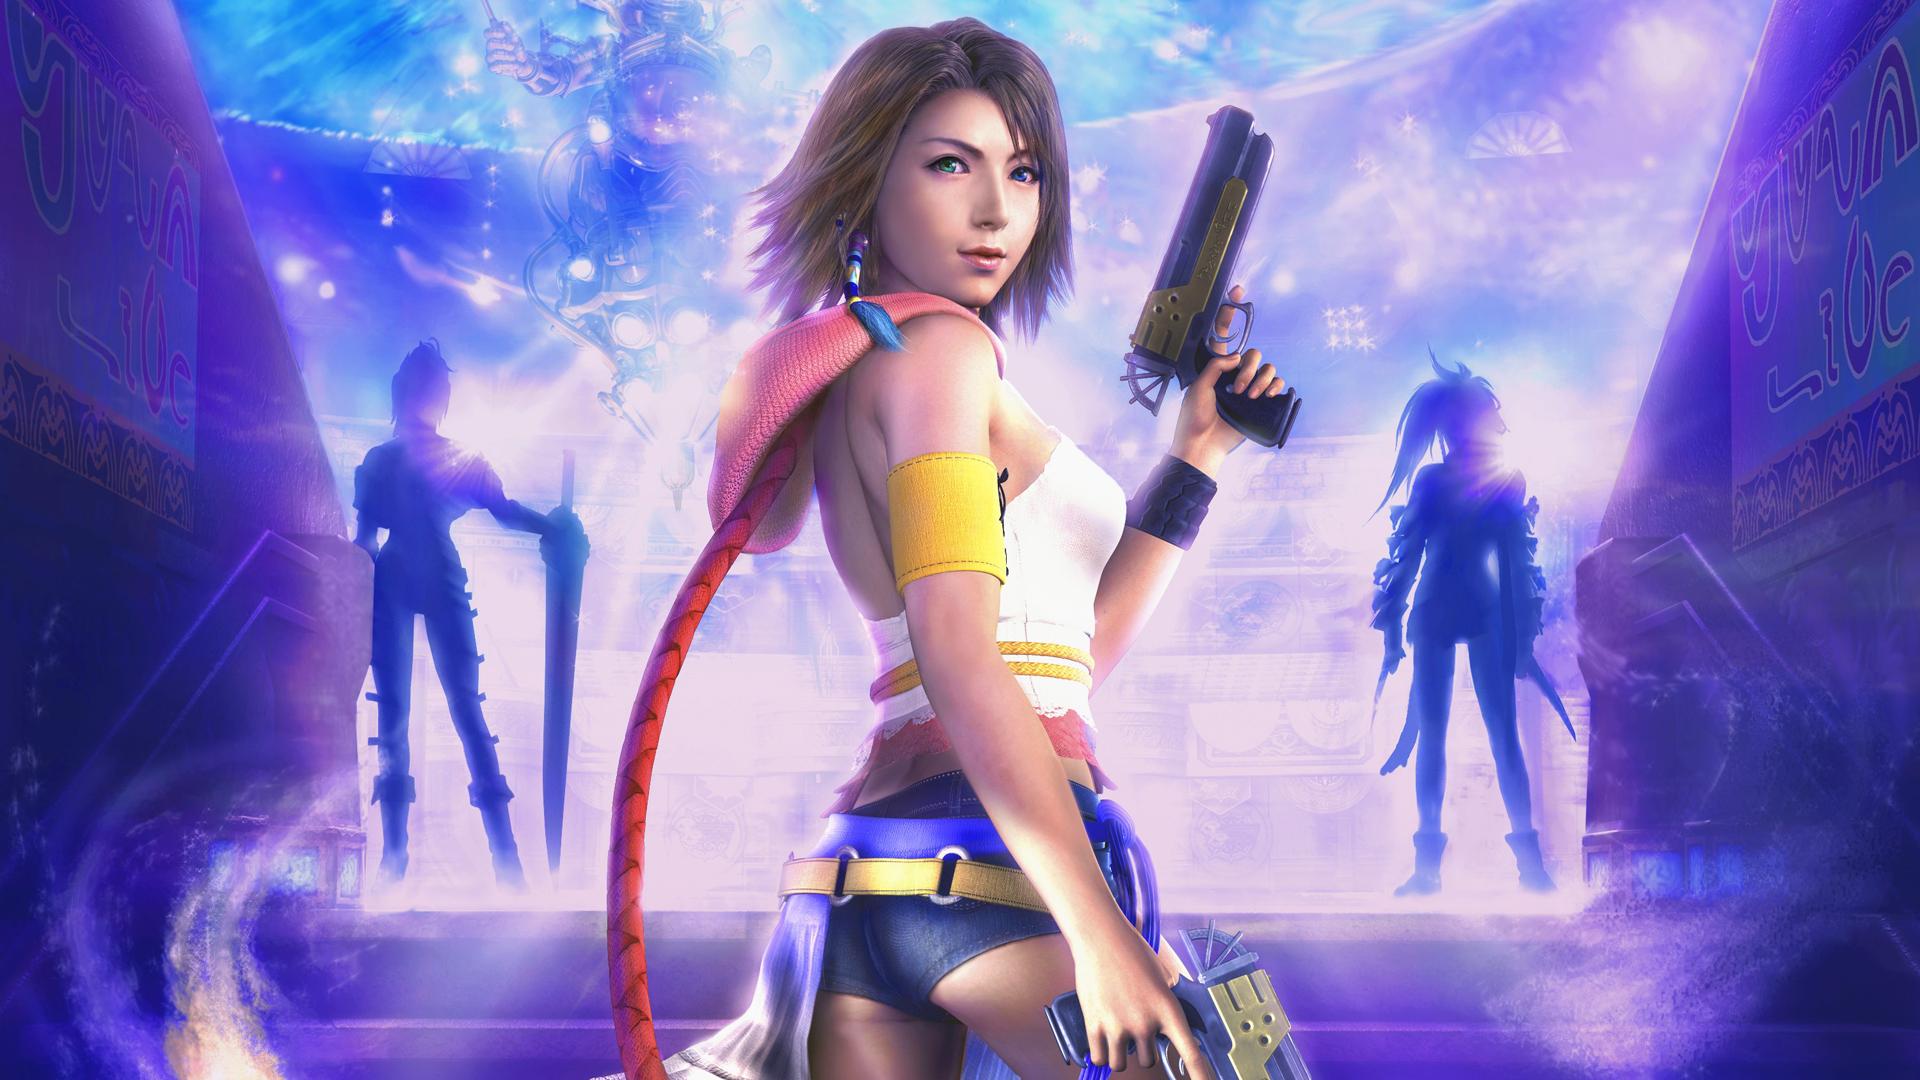 Final Fantasy X 2 Wallpaper HD Wallpaper Background